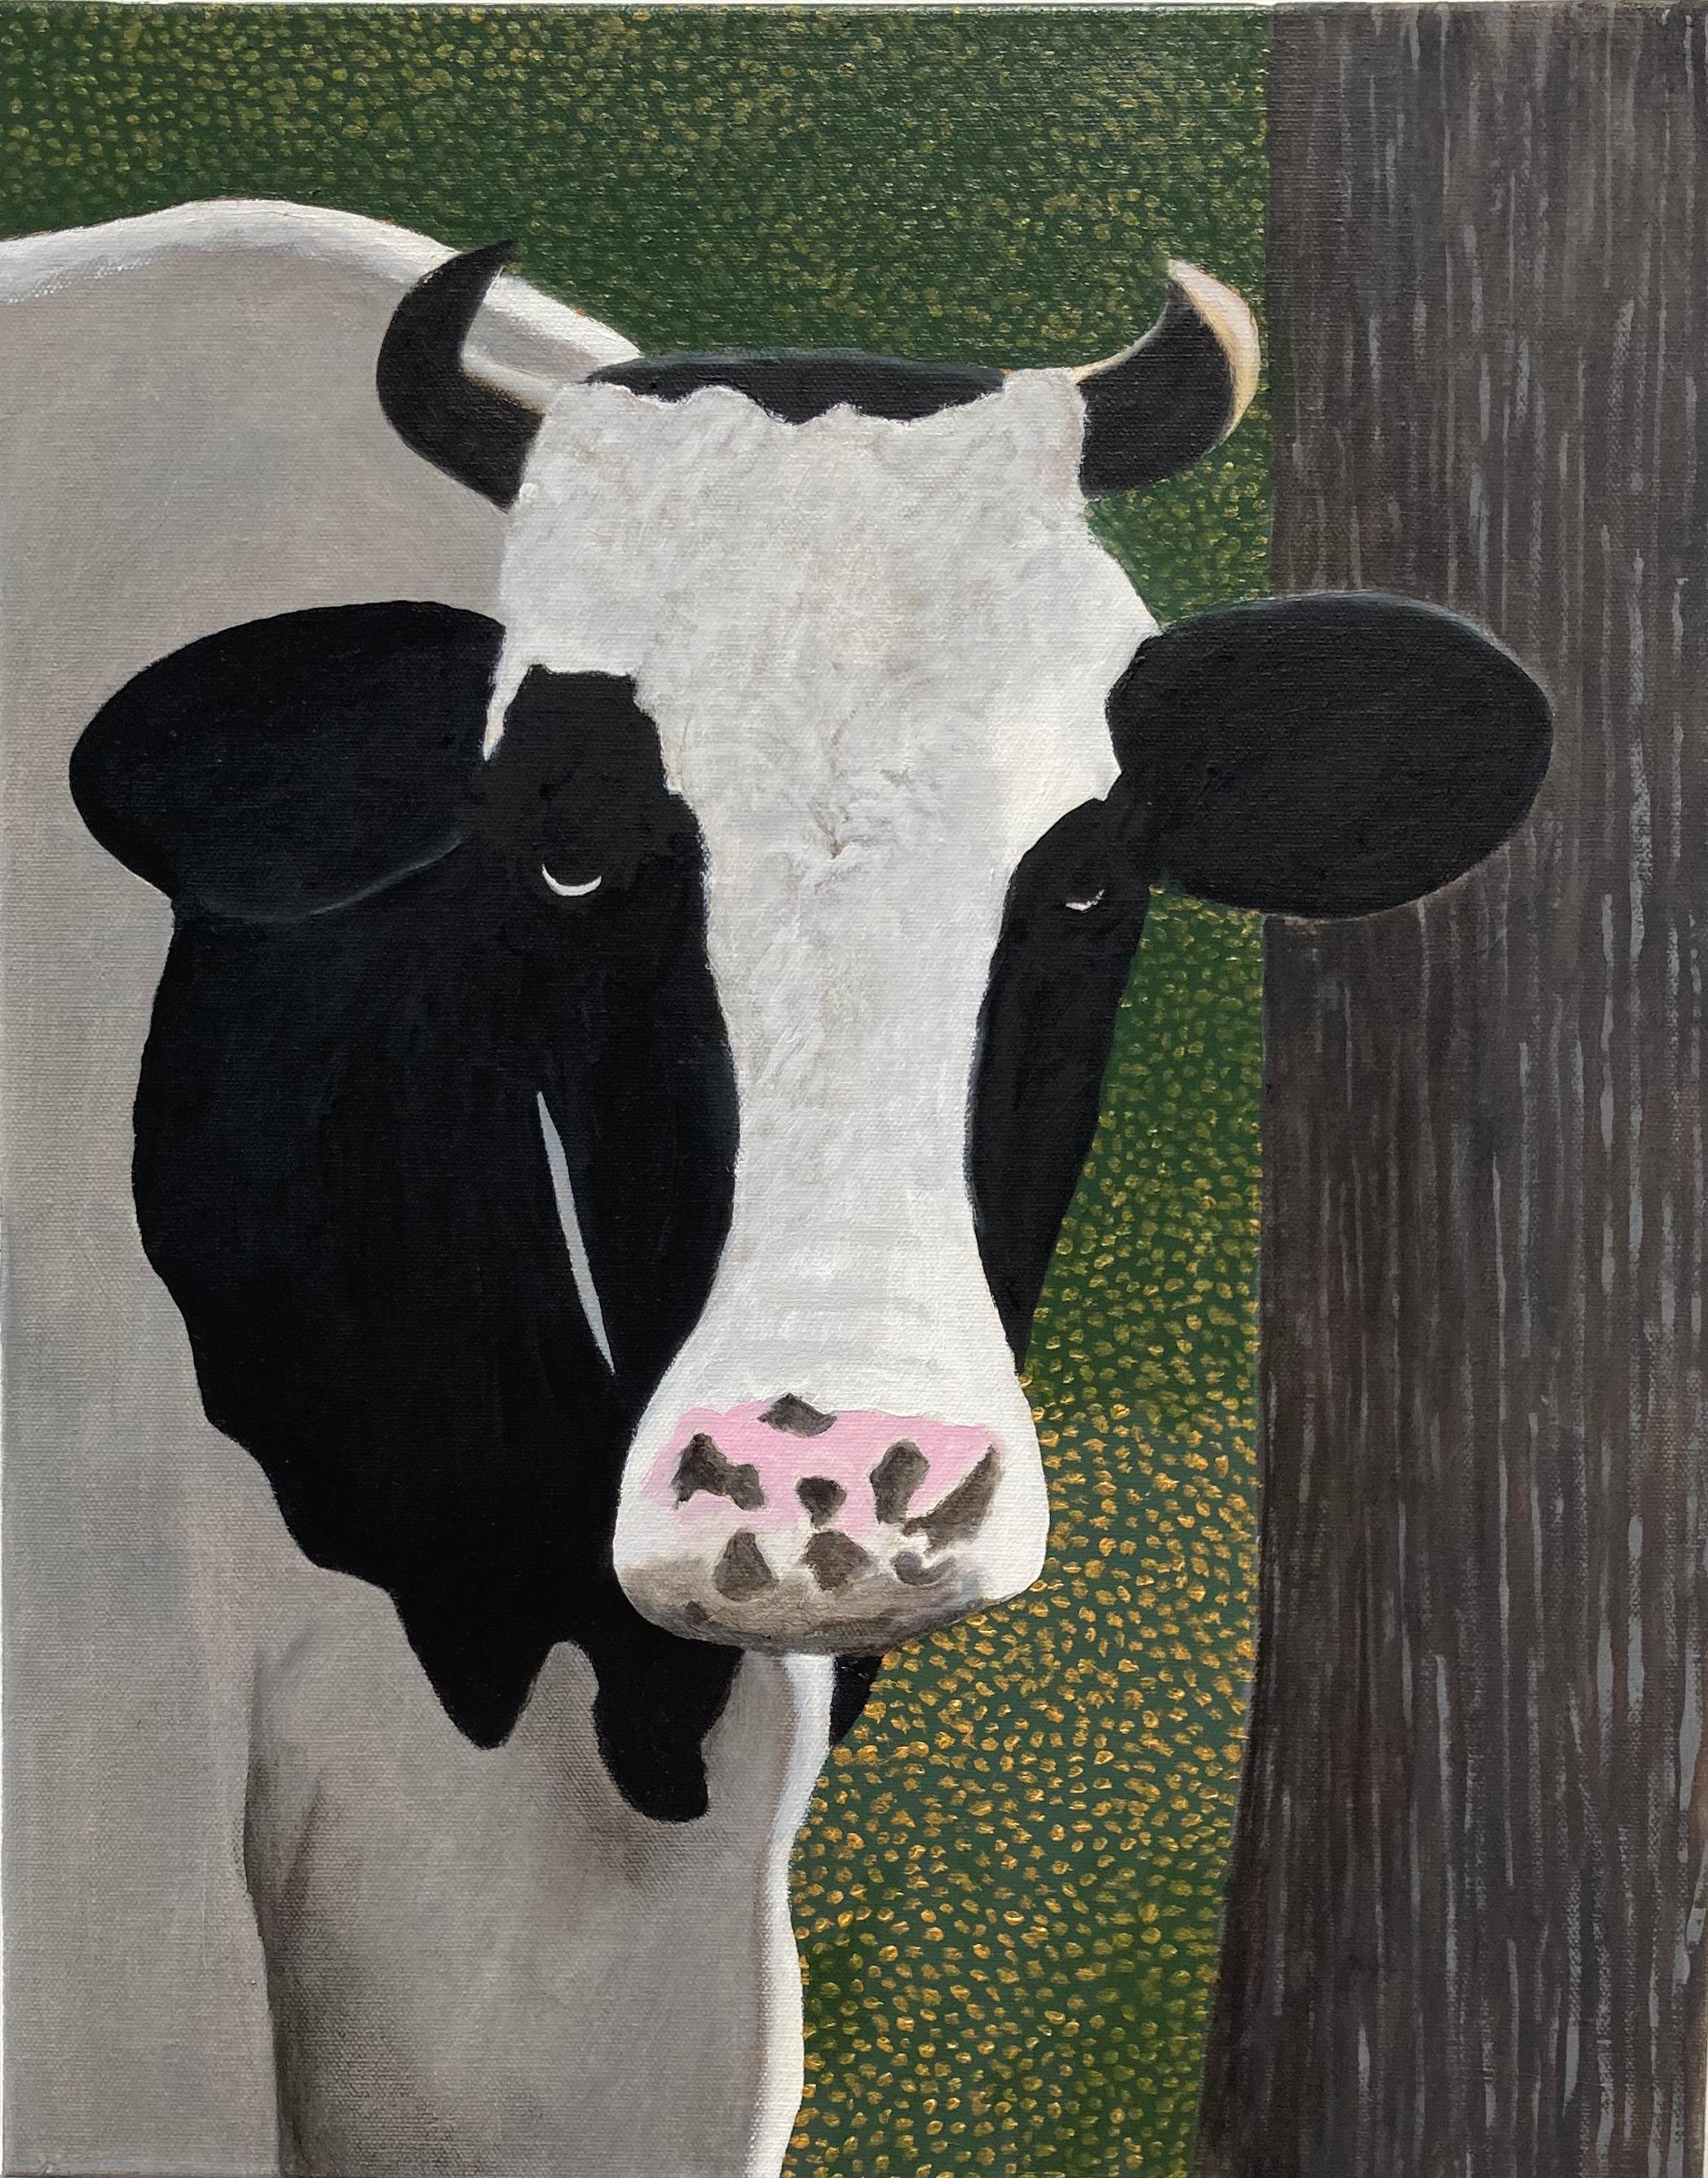 La jolie vache viii tmvfev